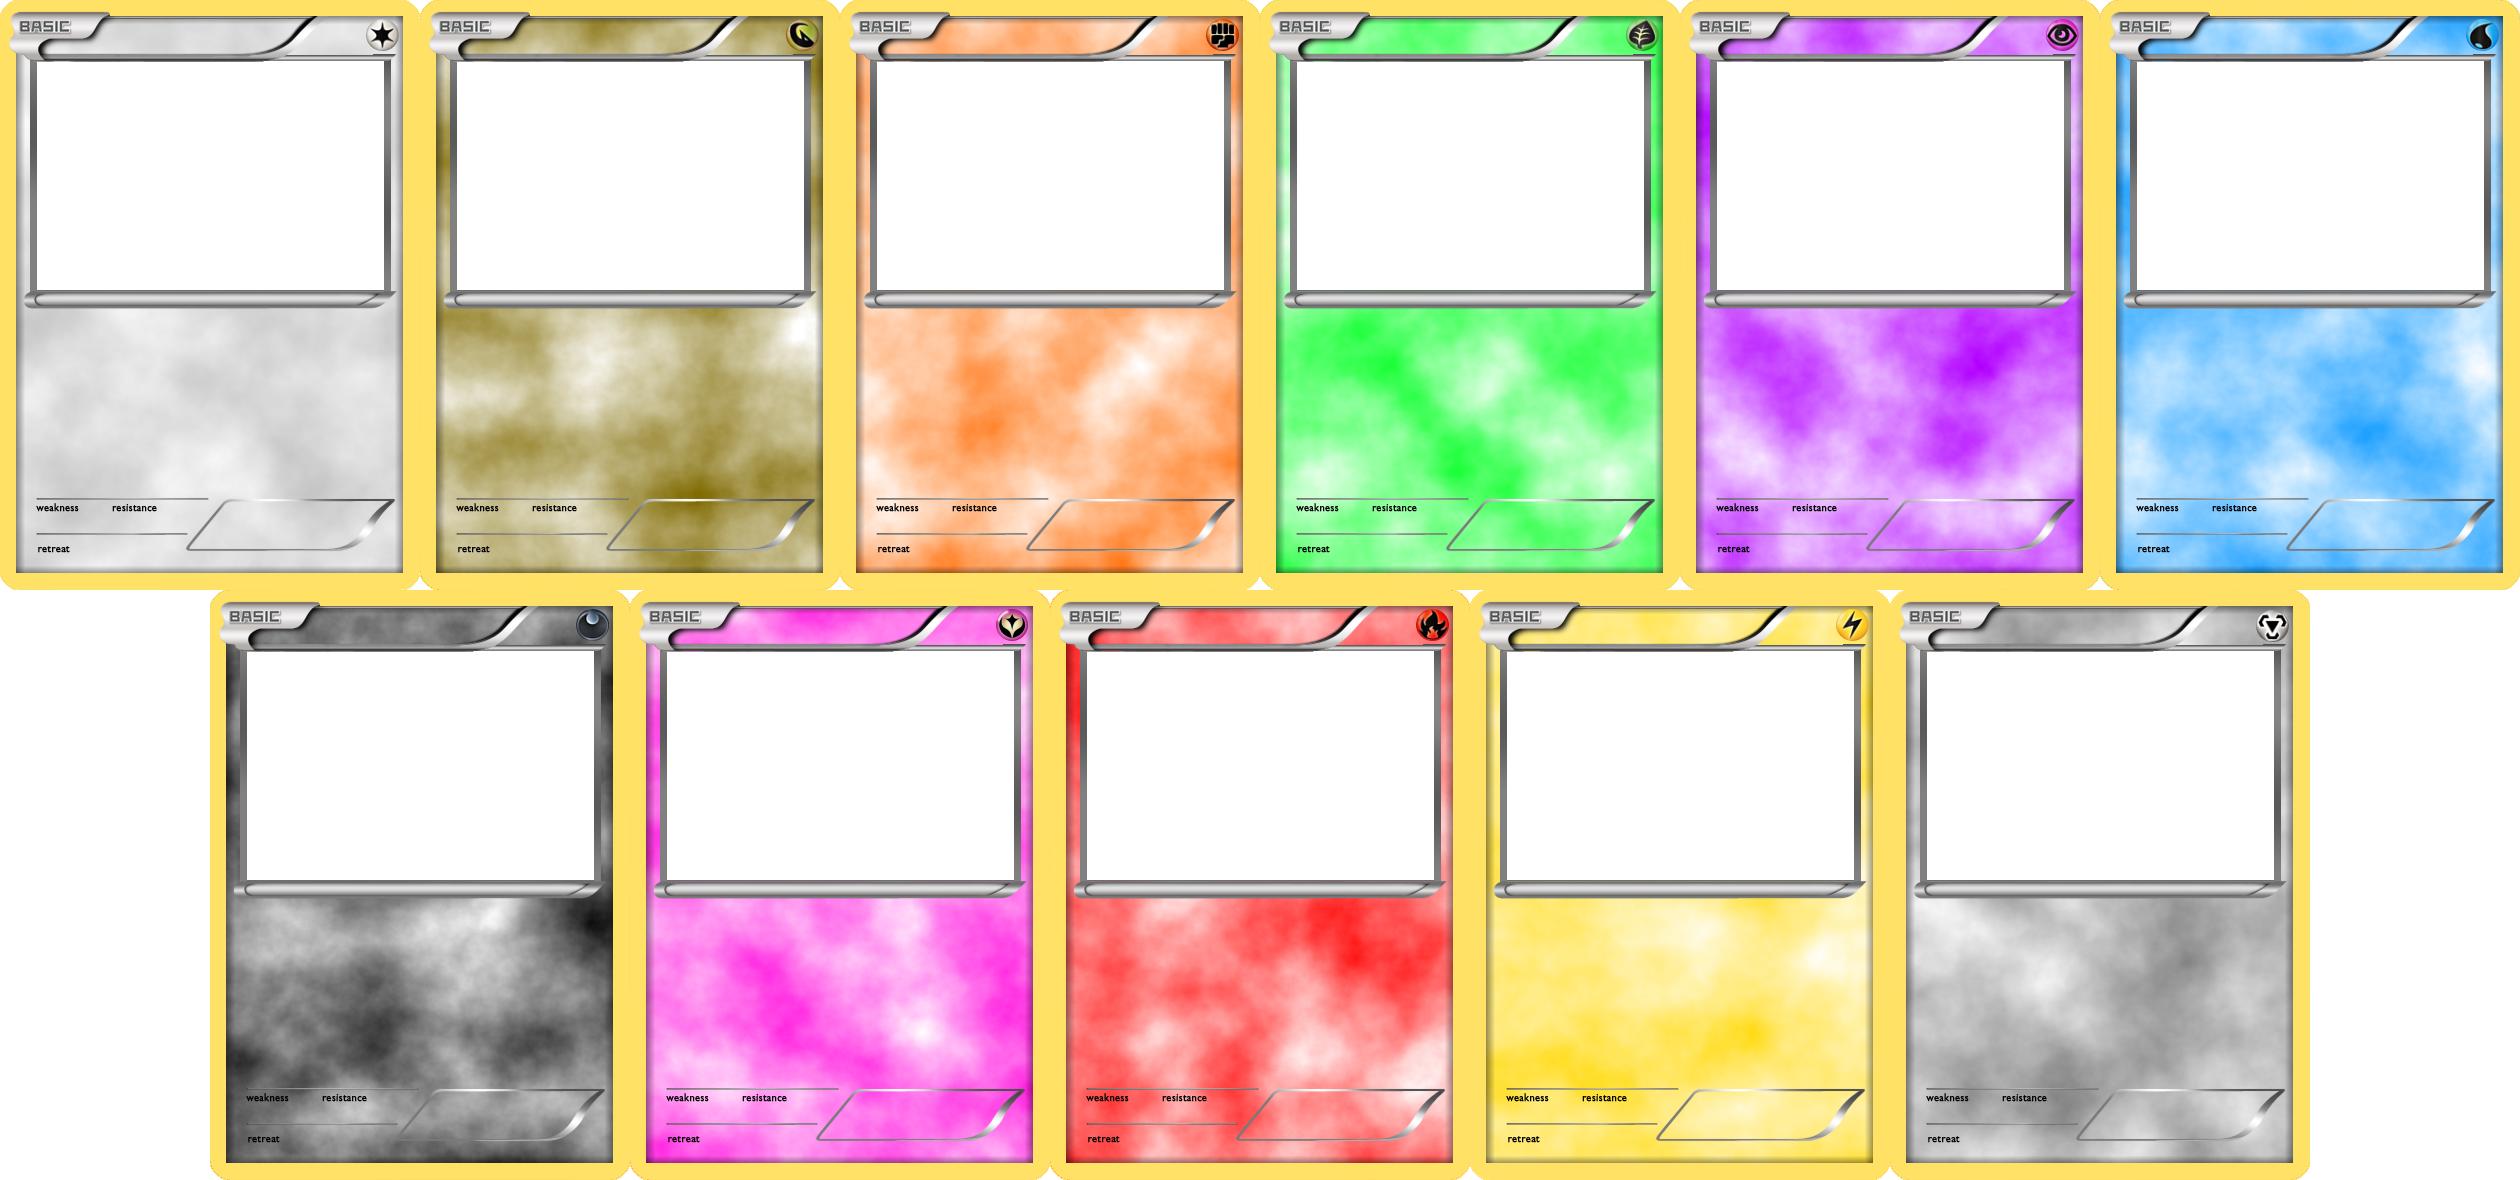 Pokemon Blank Card Templates Basic By Levelinfinitum On Deviantart In 2020 Pokemon Card Template Trading Card Template Blank Card Template